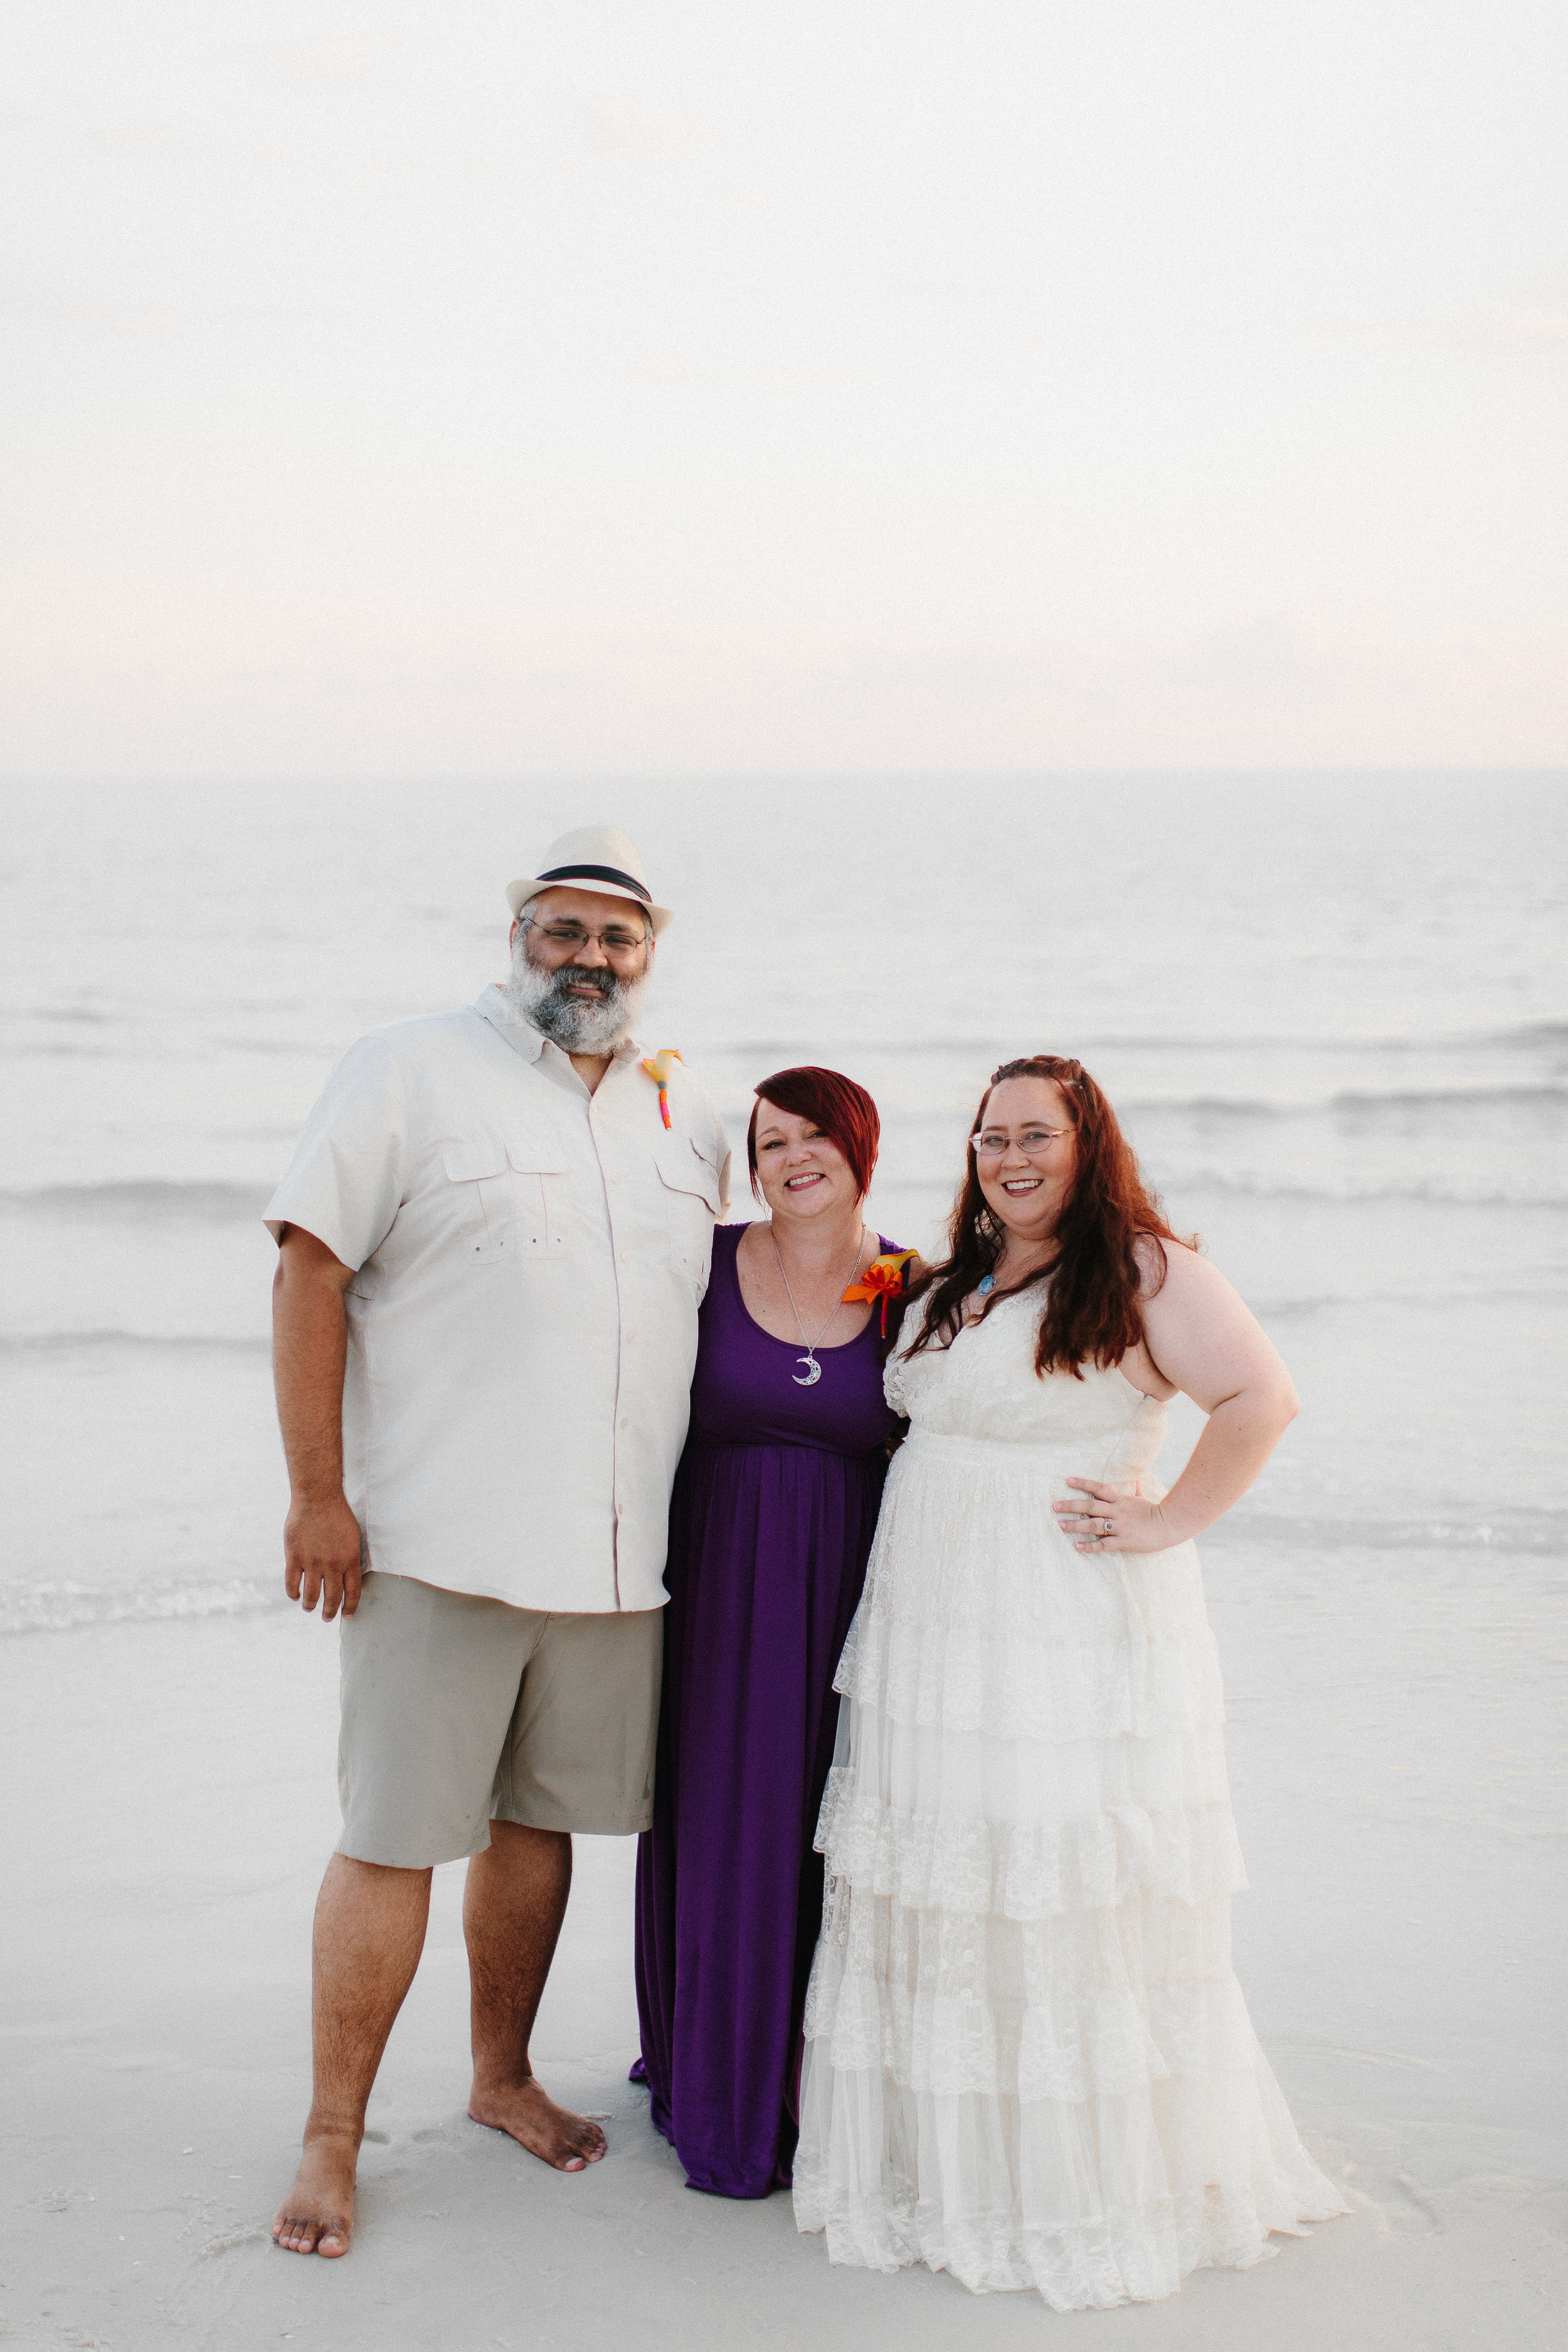 destin_sunset_beach_elopement_intimate_wedding_photographer_florida_documentary_1338.jpg